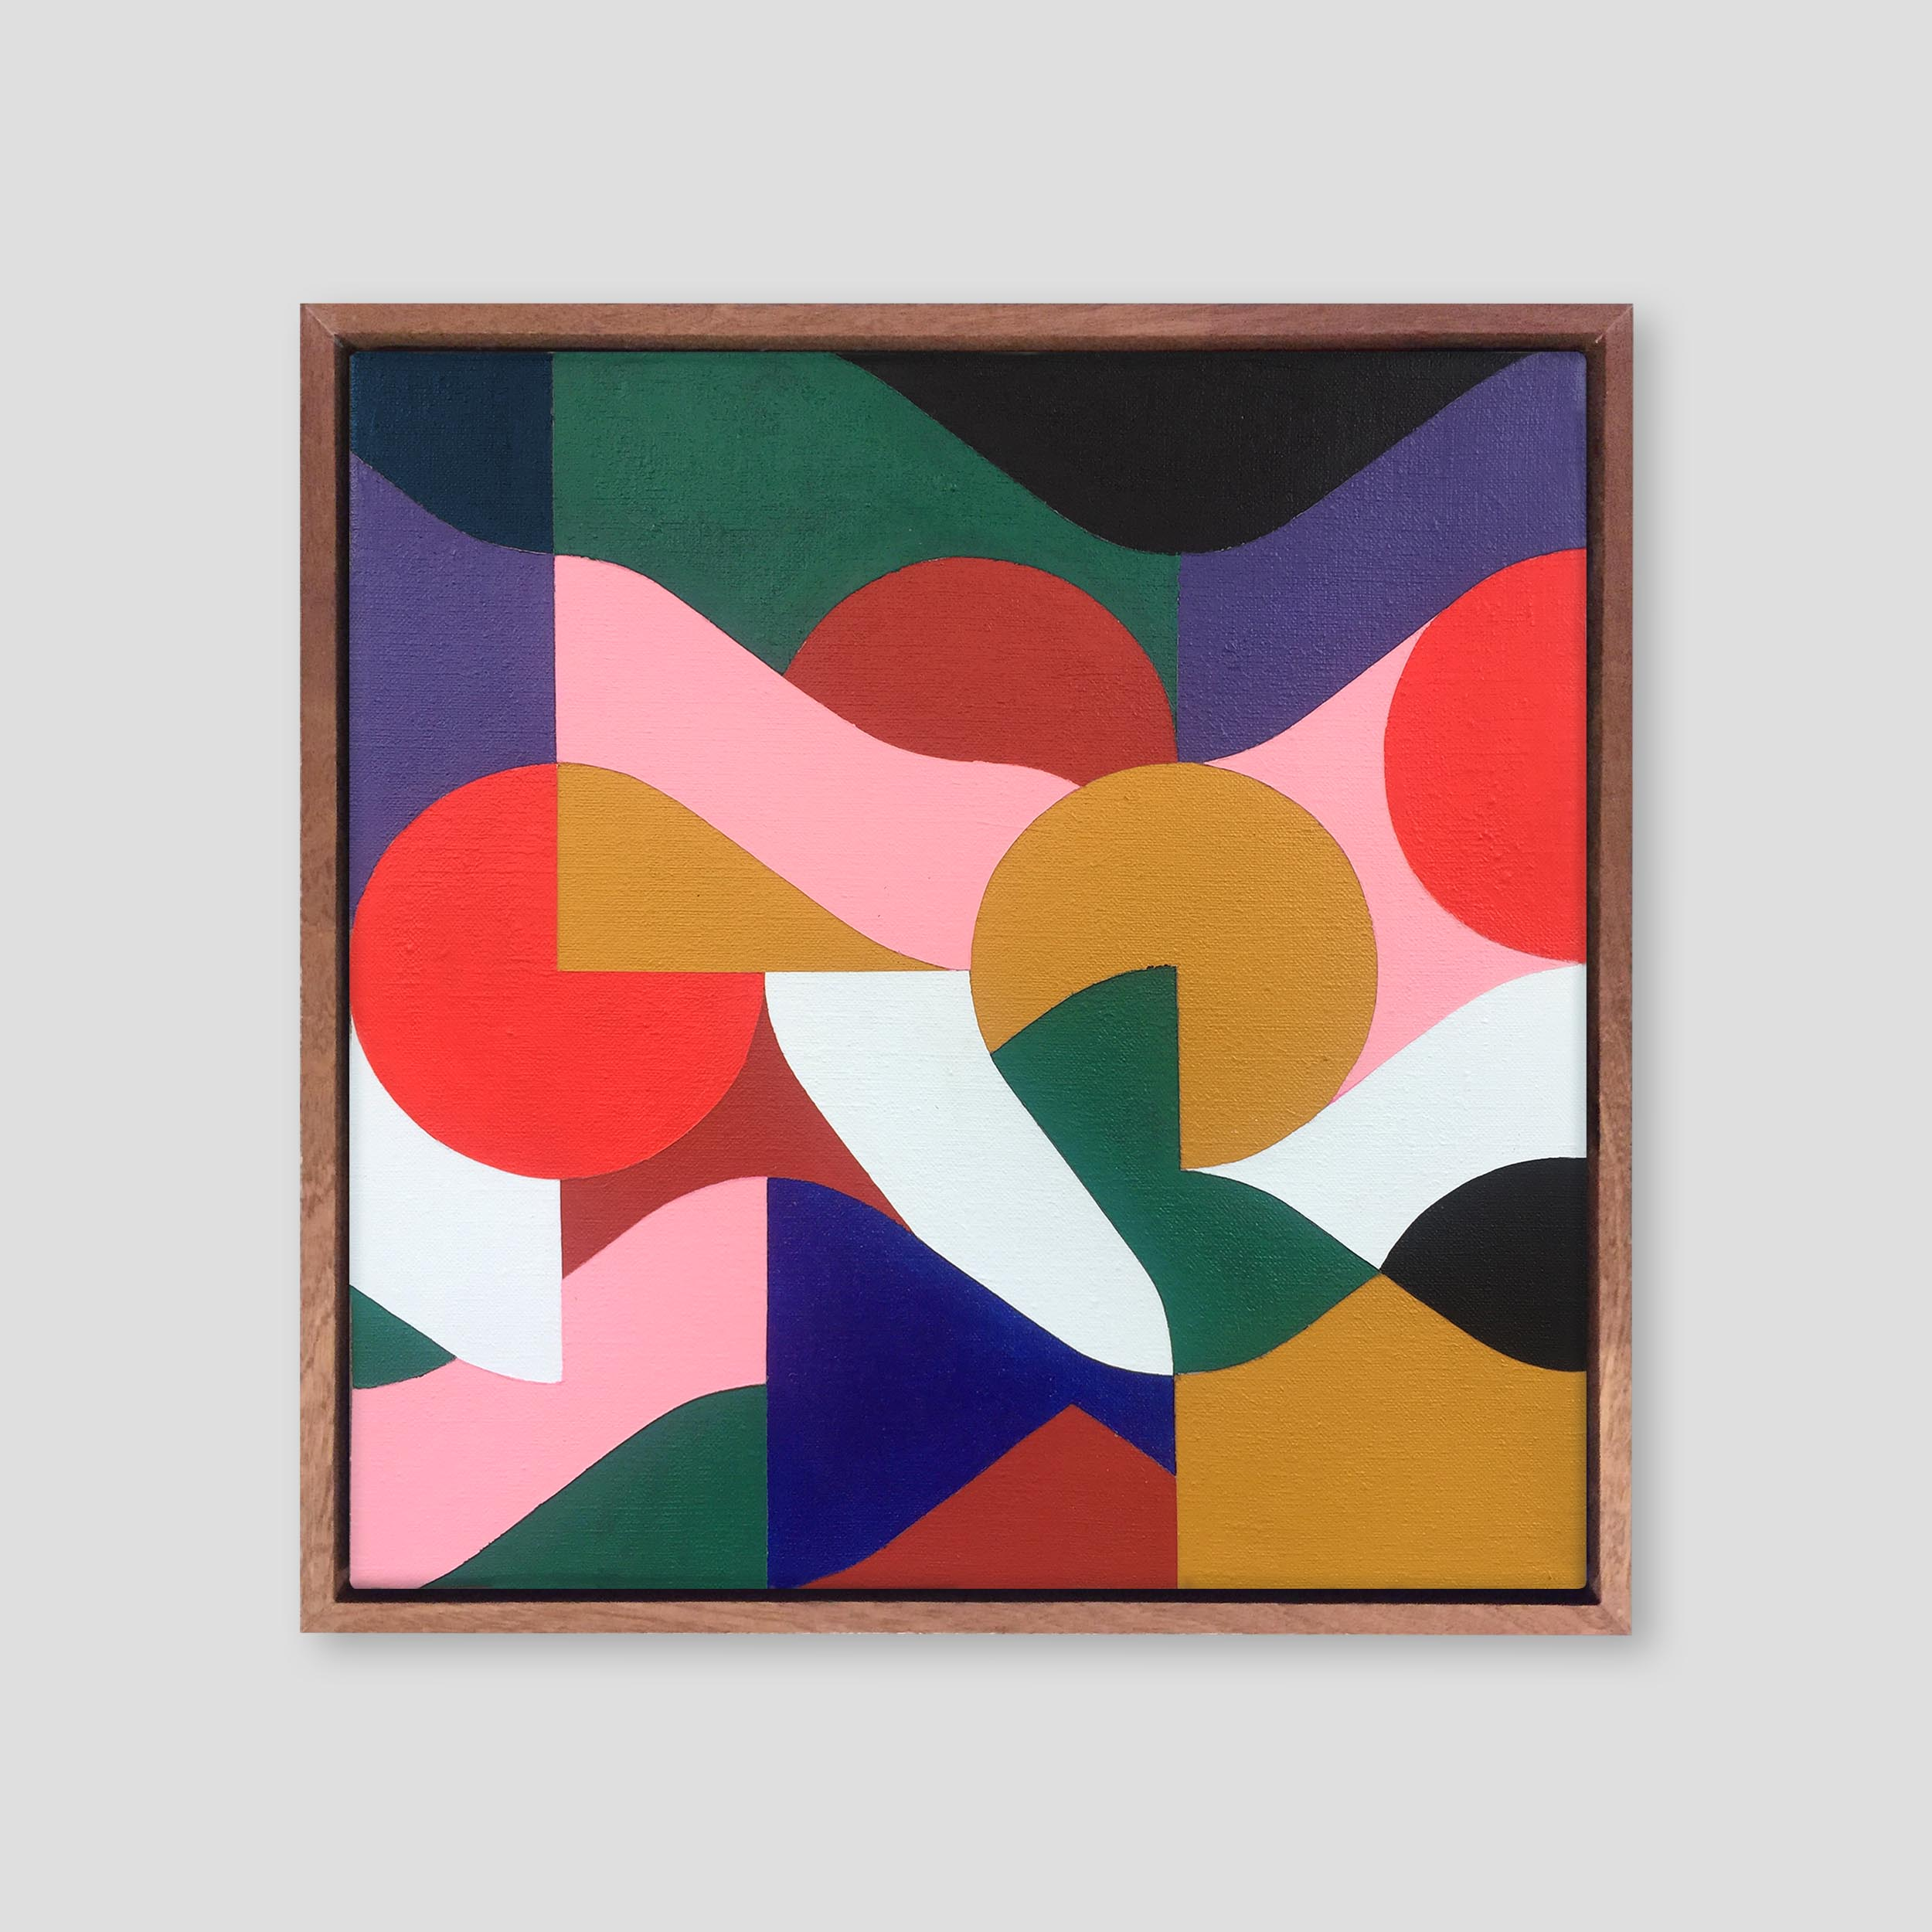 Square composition no. 11